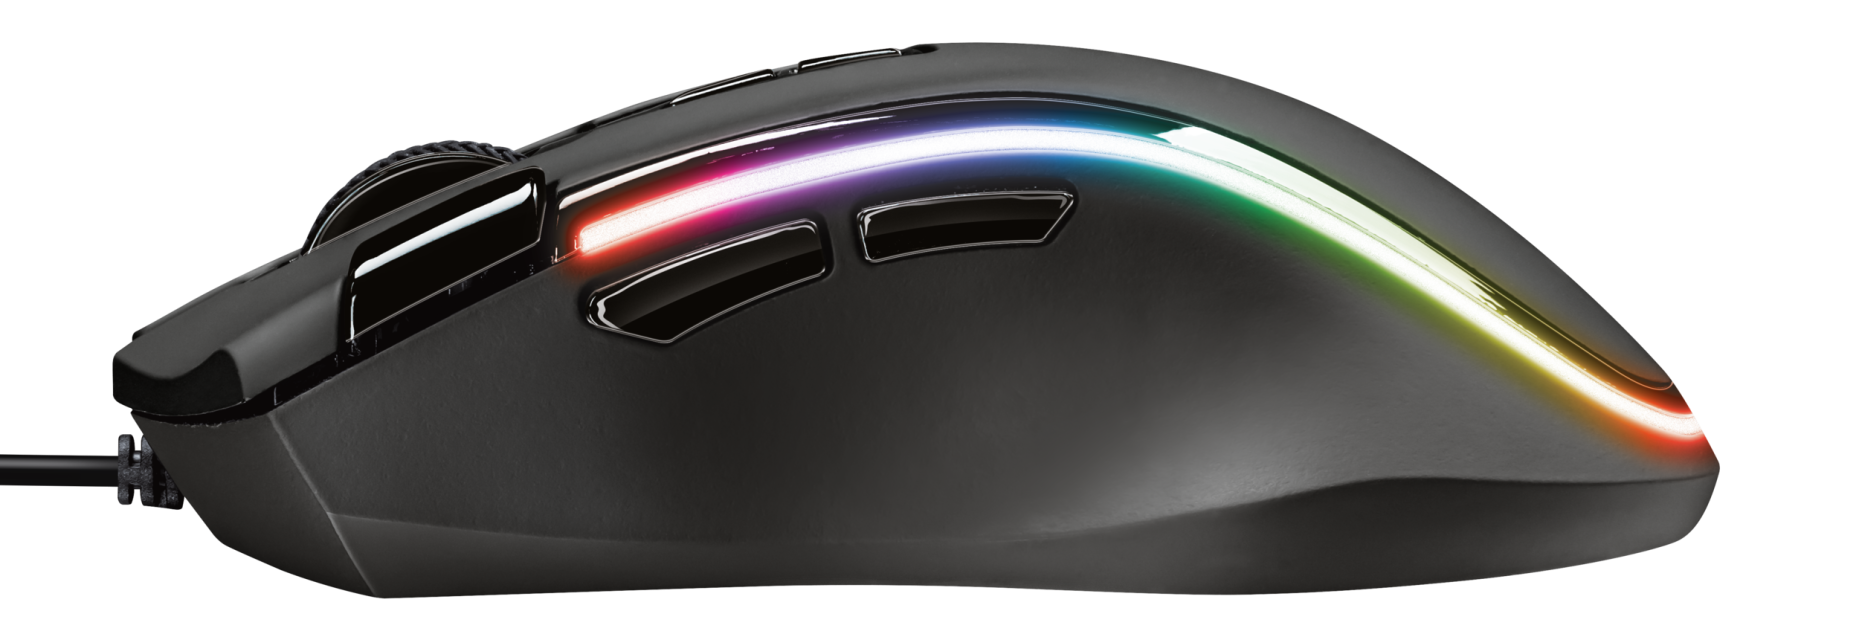 GXT 188 Laban RGB